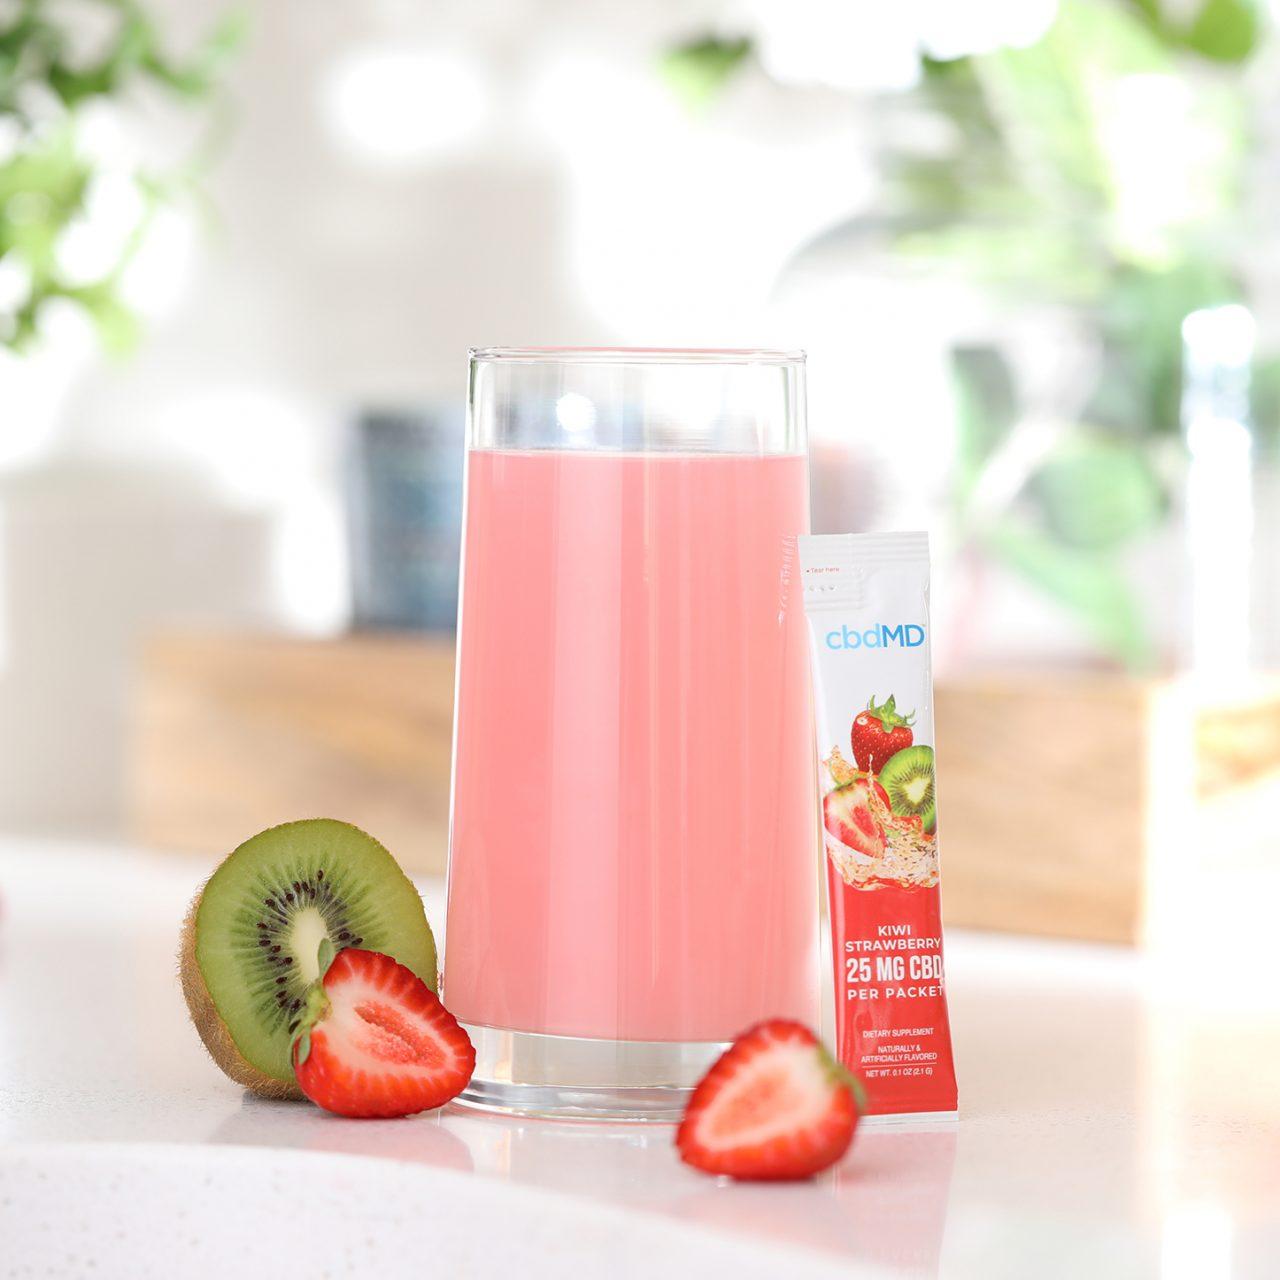 cbdMD, CBD Powdered Drink Mix, Broad Spectrum THC-Free, Kiwi Strawberry, 10ct, 250mg CBD 3